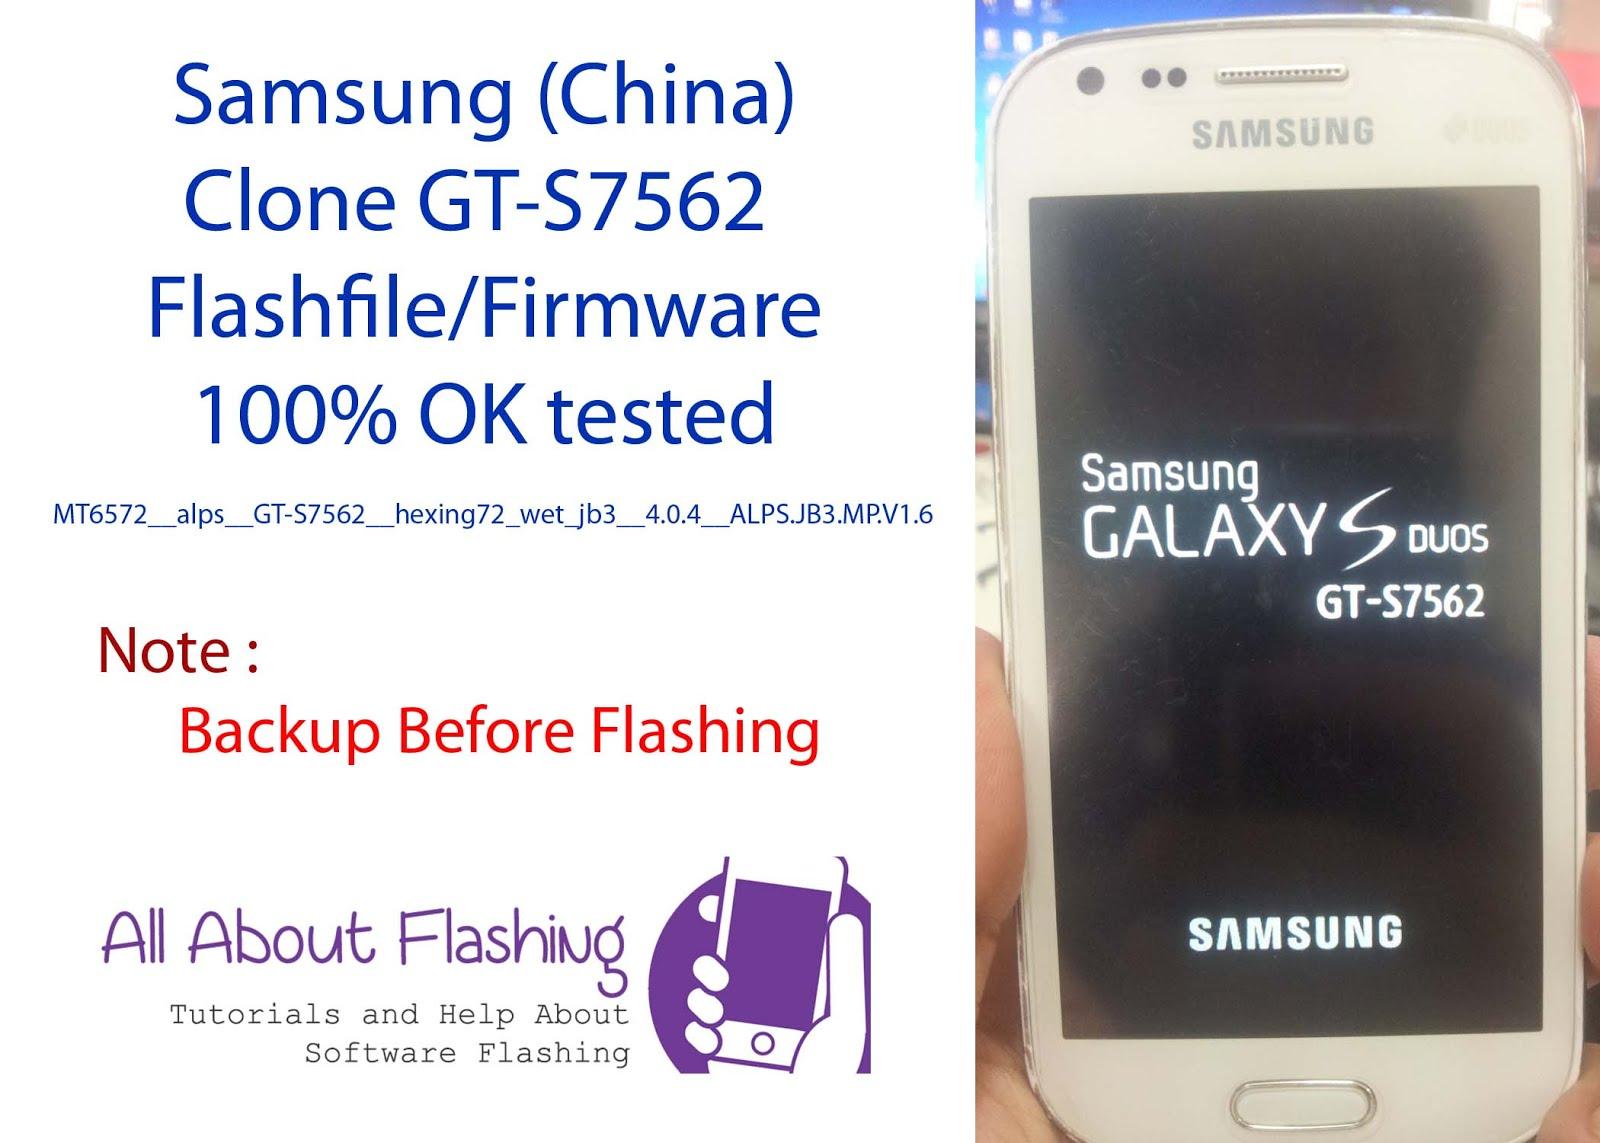 Samsung (China) Clone GT-S7562 Flashfile/Firmware 100% OK